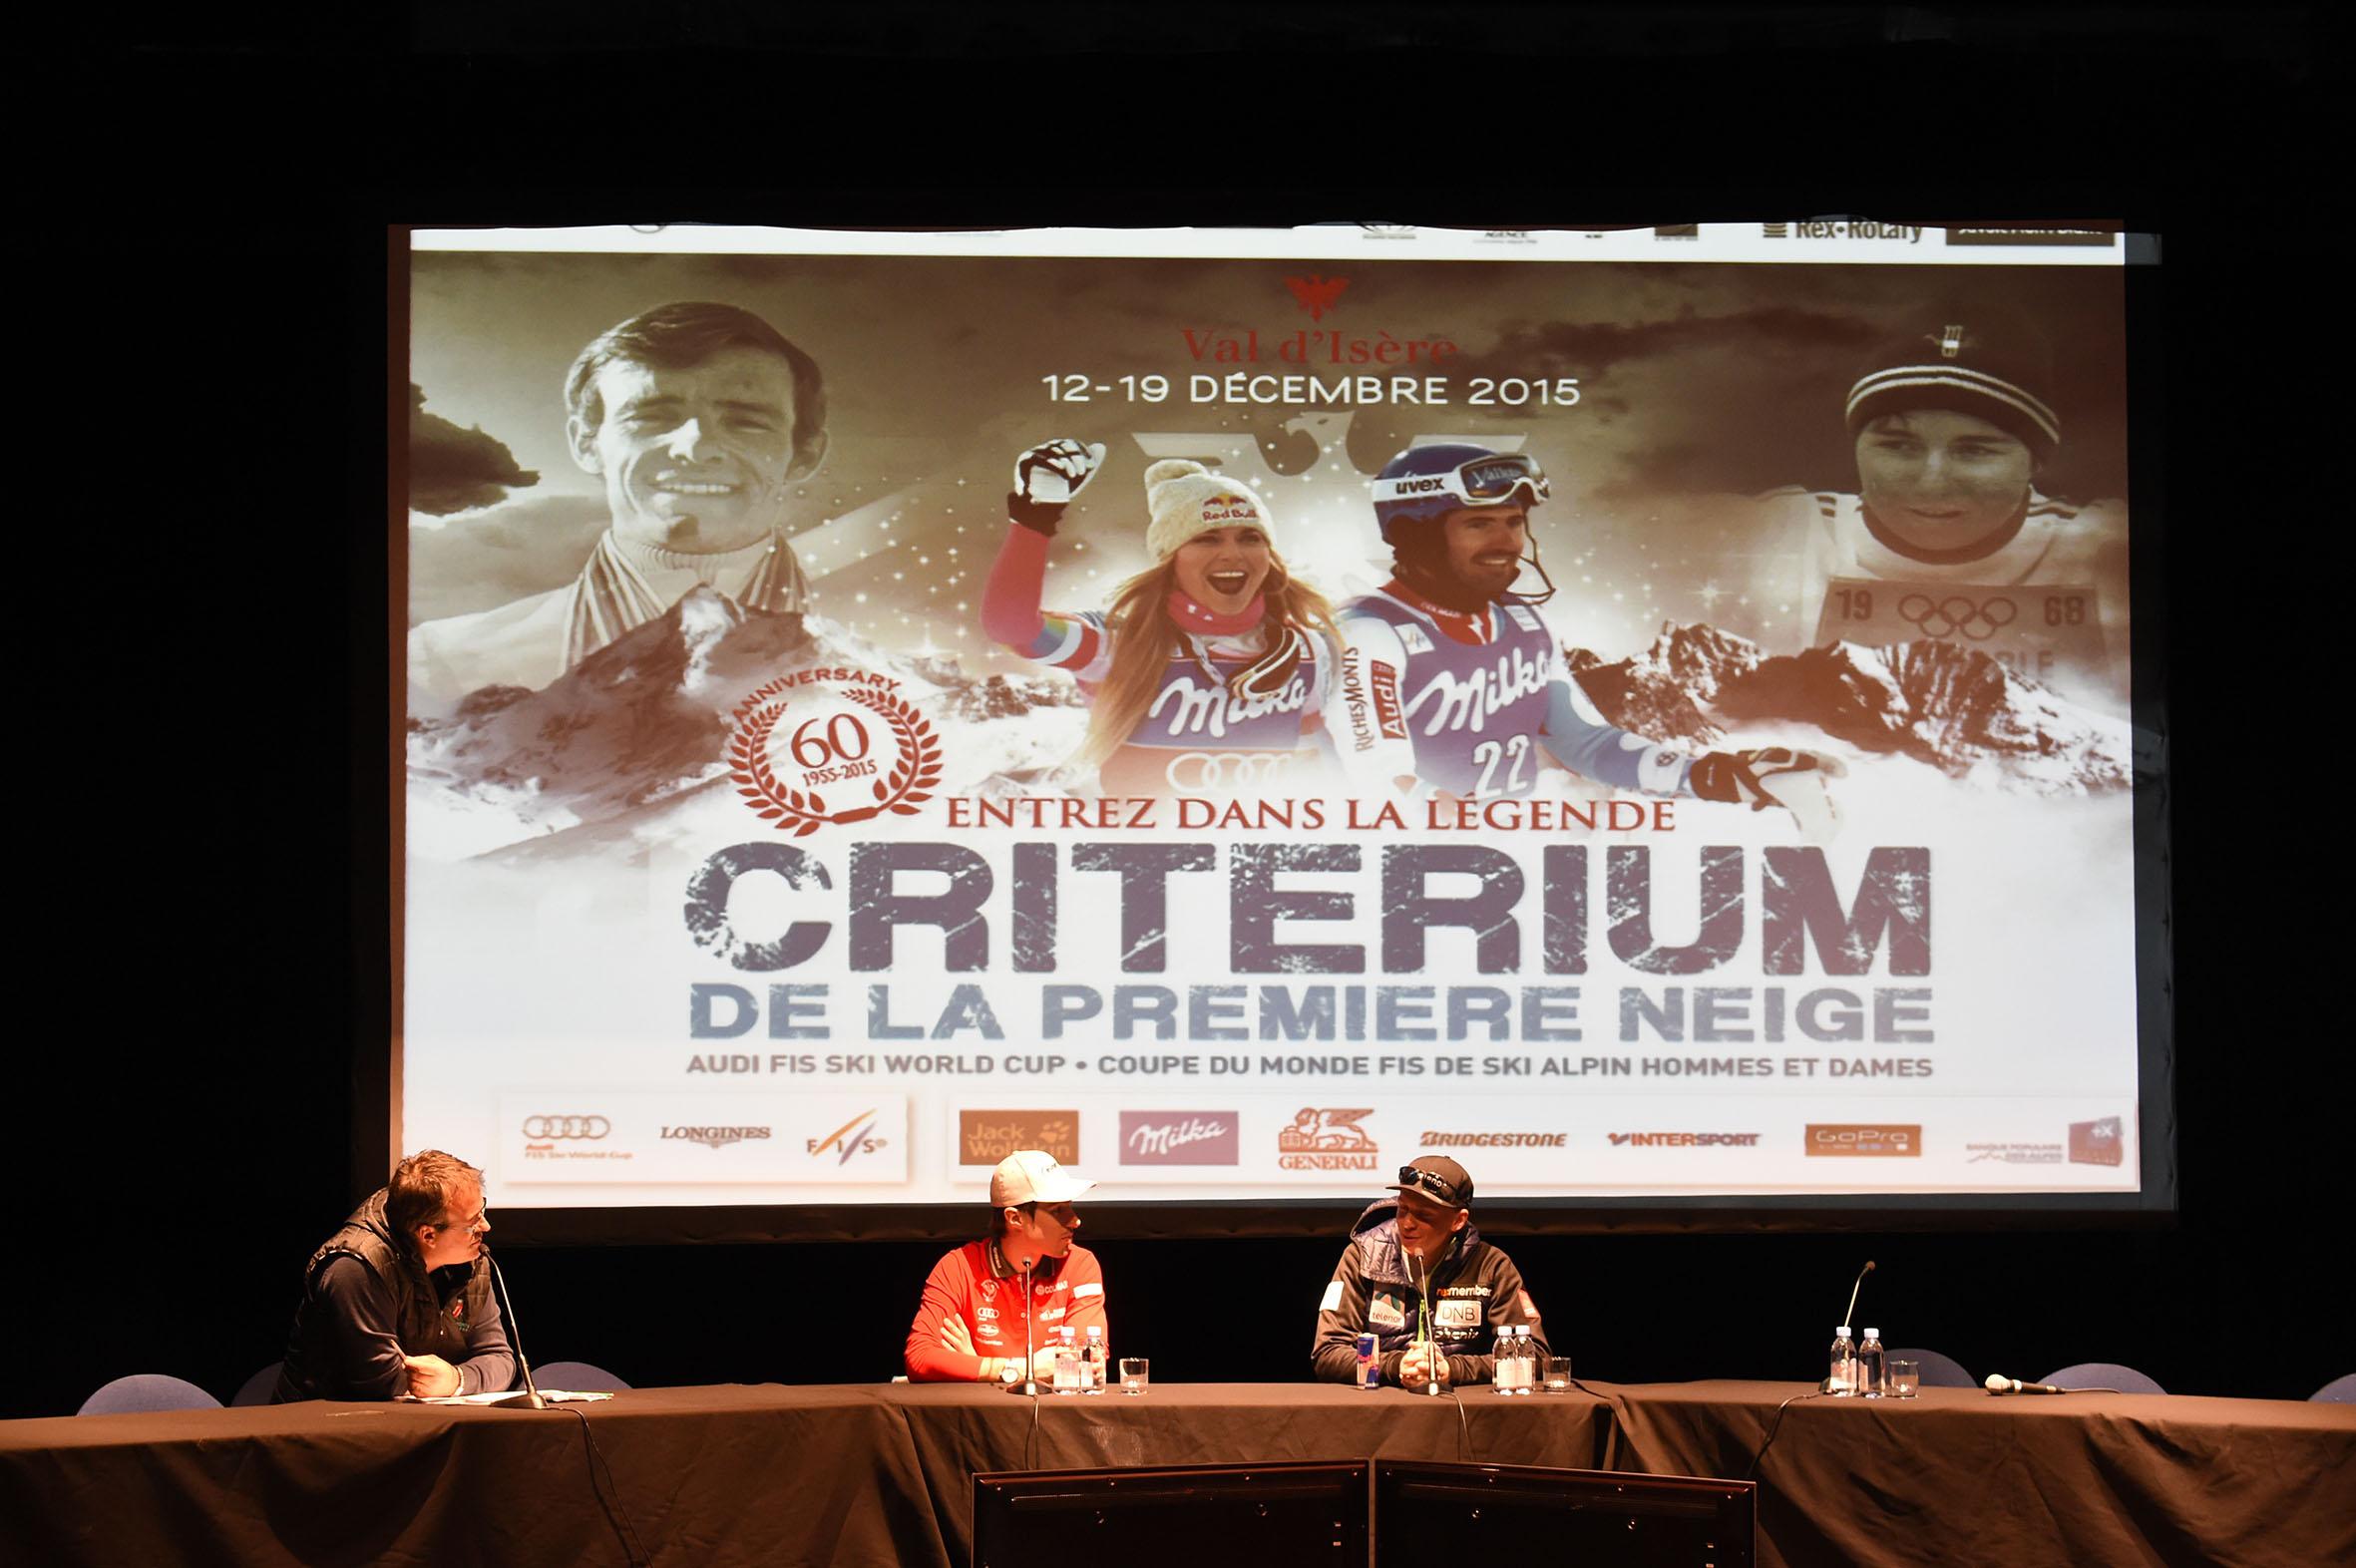 Yves PERRET, Victor MUFFAT-JEANDET, Henrik KRISTOFFERSEN